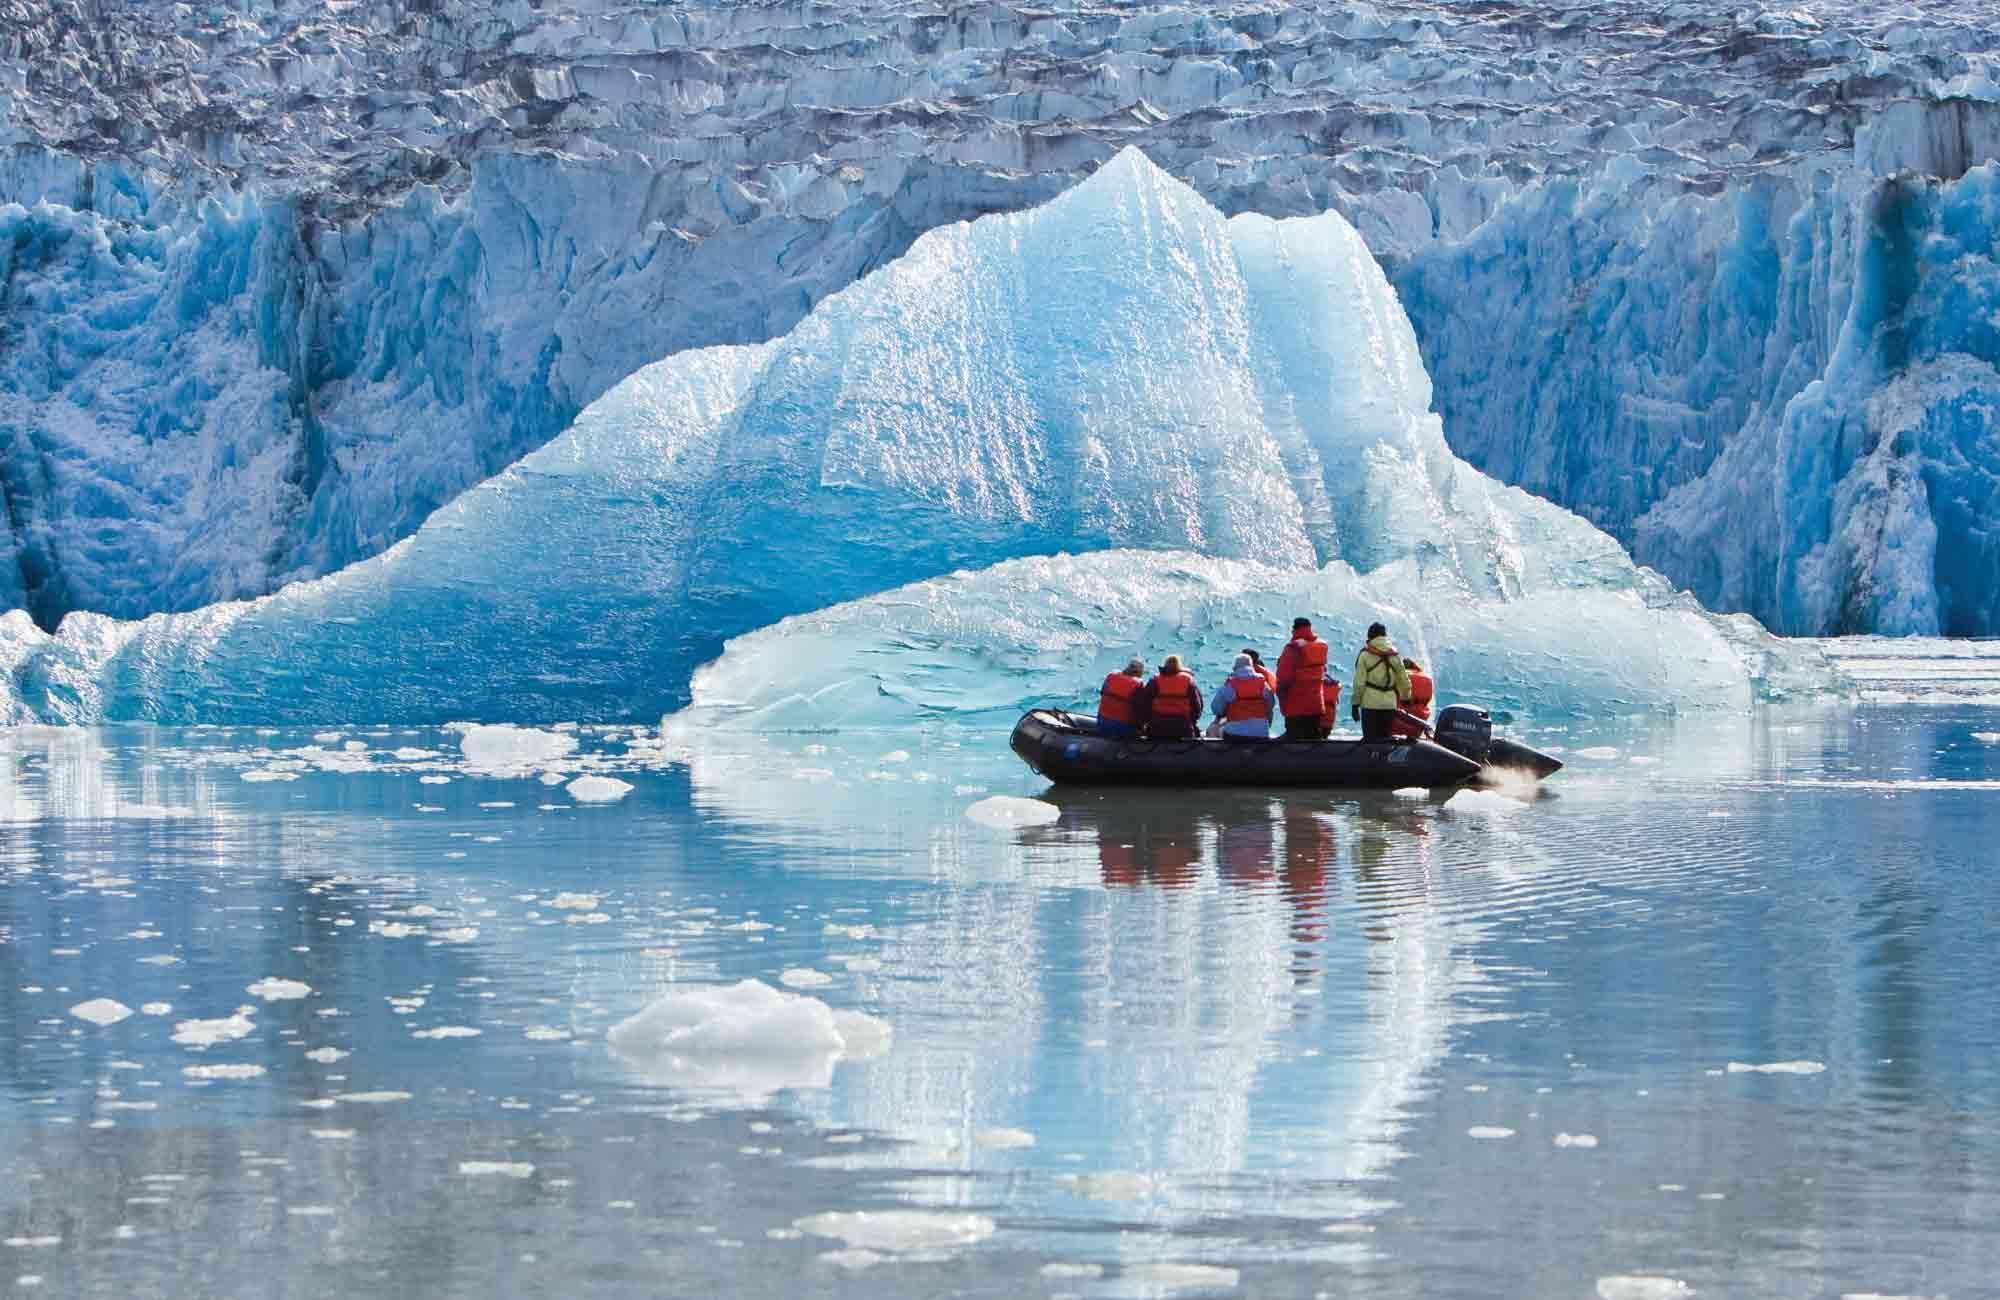 Crédit Photo : Lindblad Expeditions - Michael-S.-Nolan